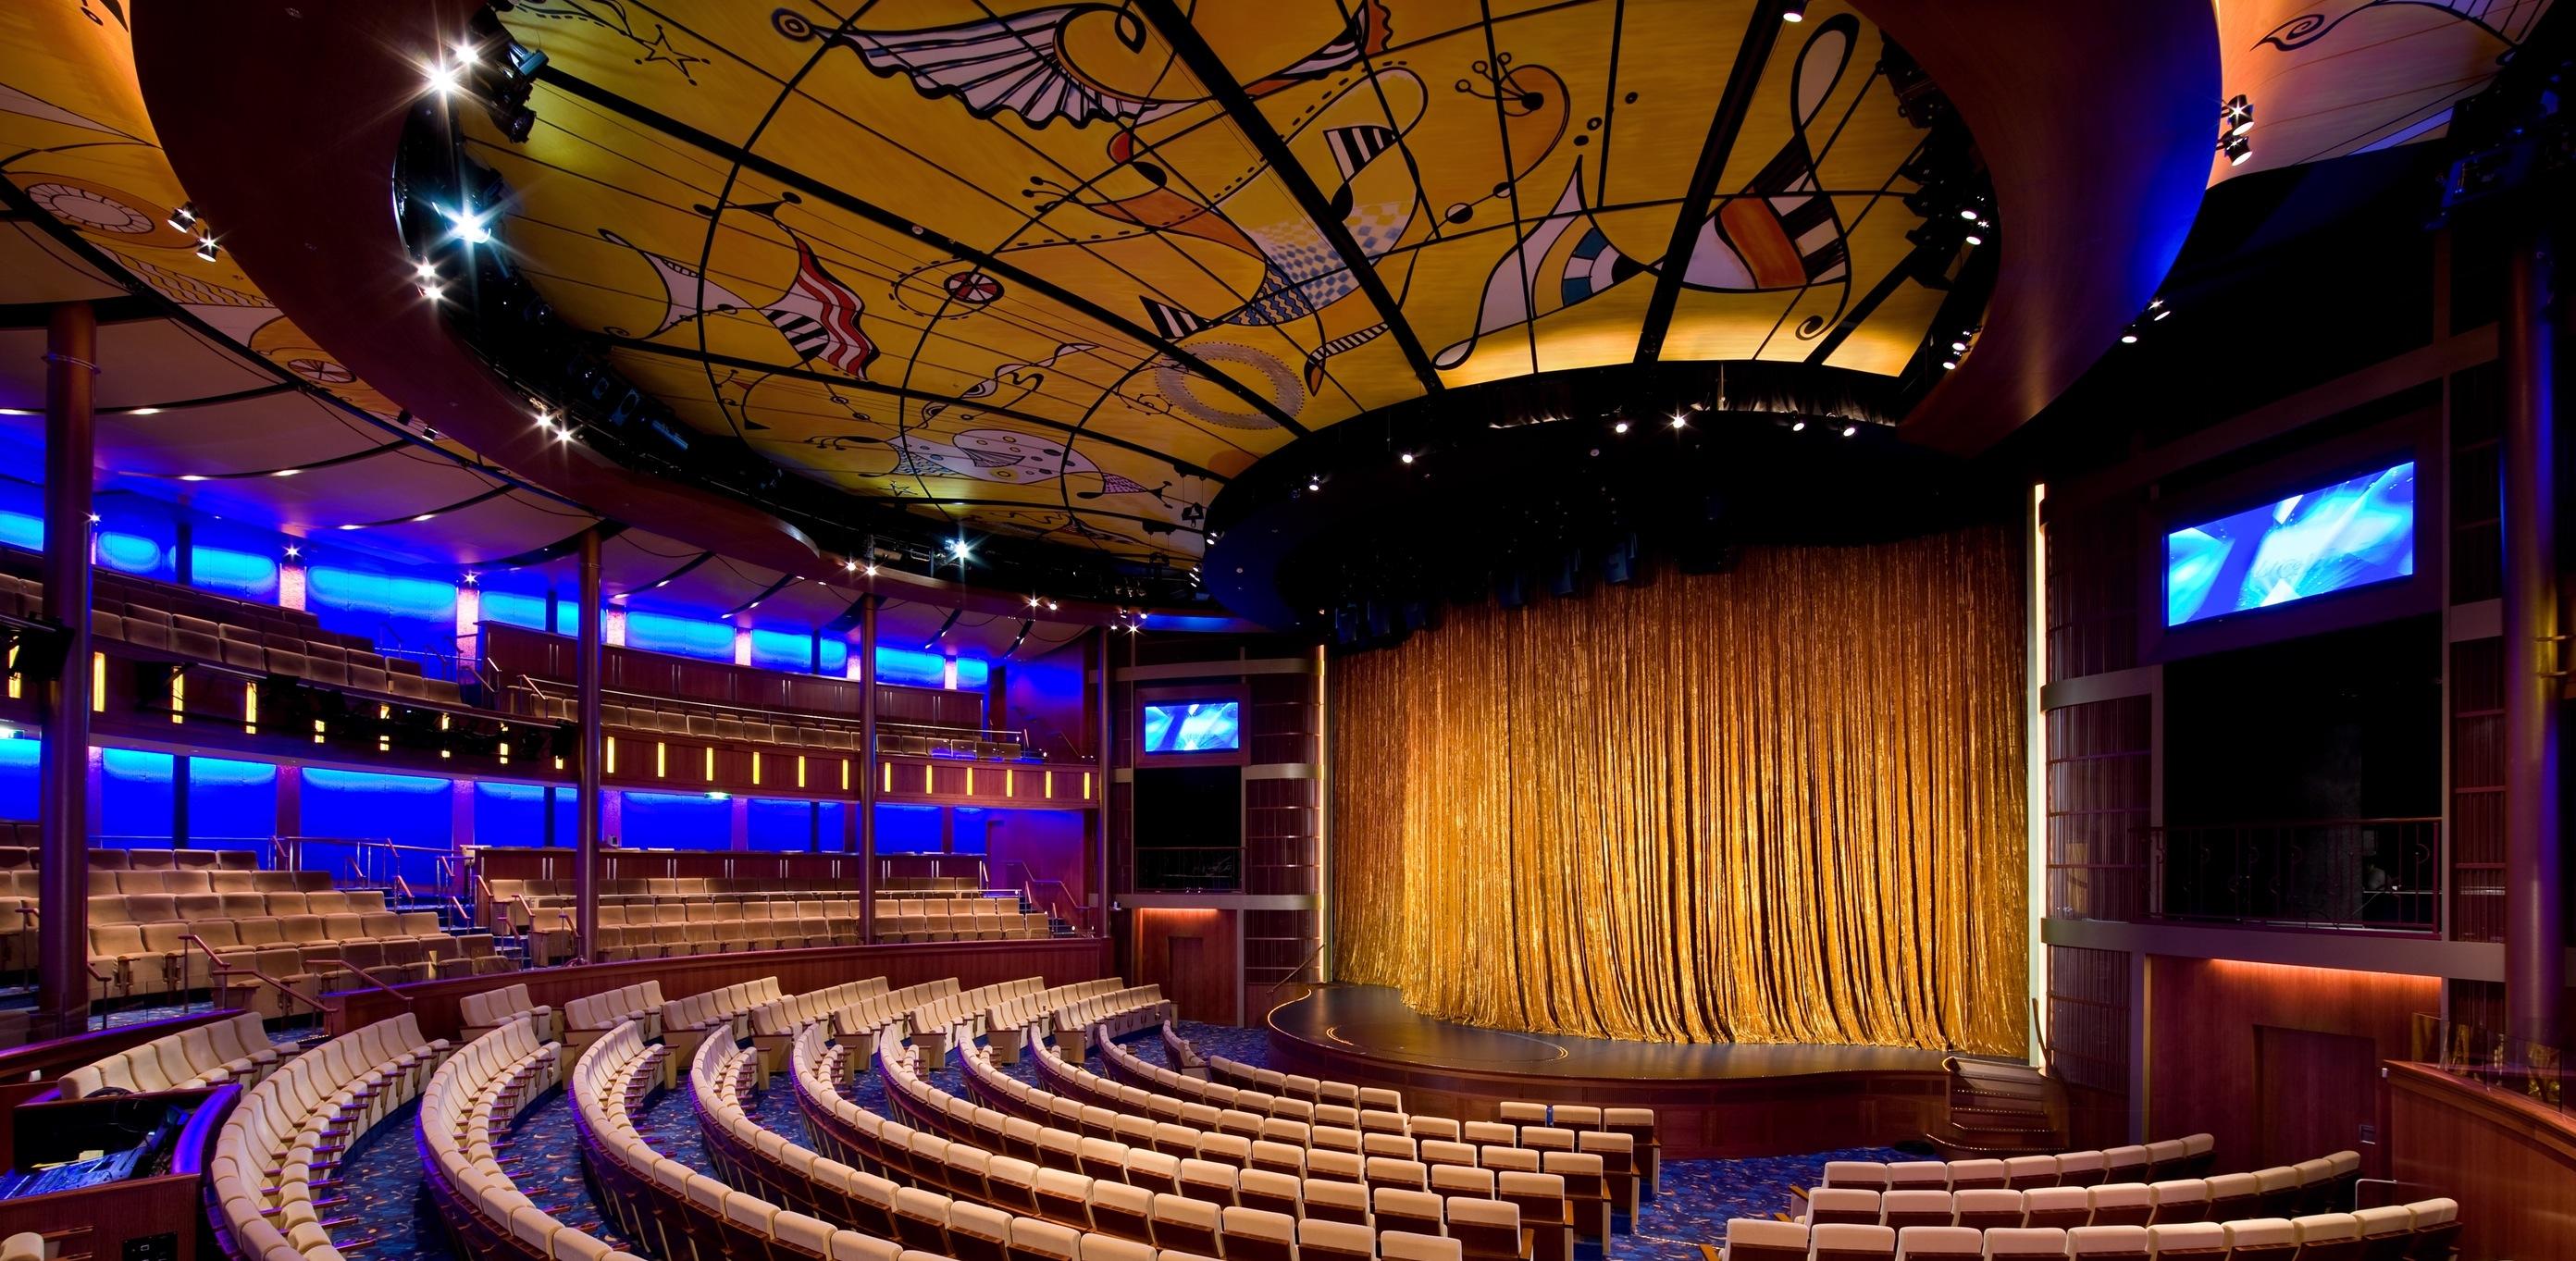 celebrty cruises celebrity solstice theater theatre.jpg